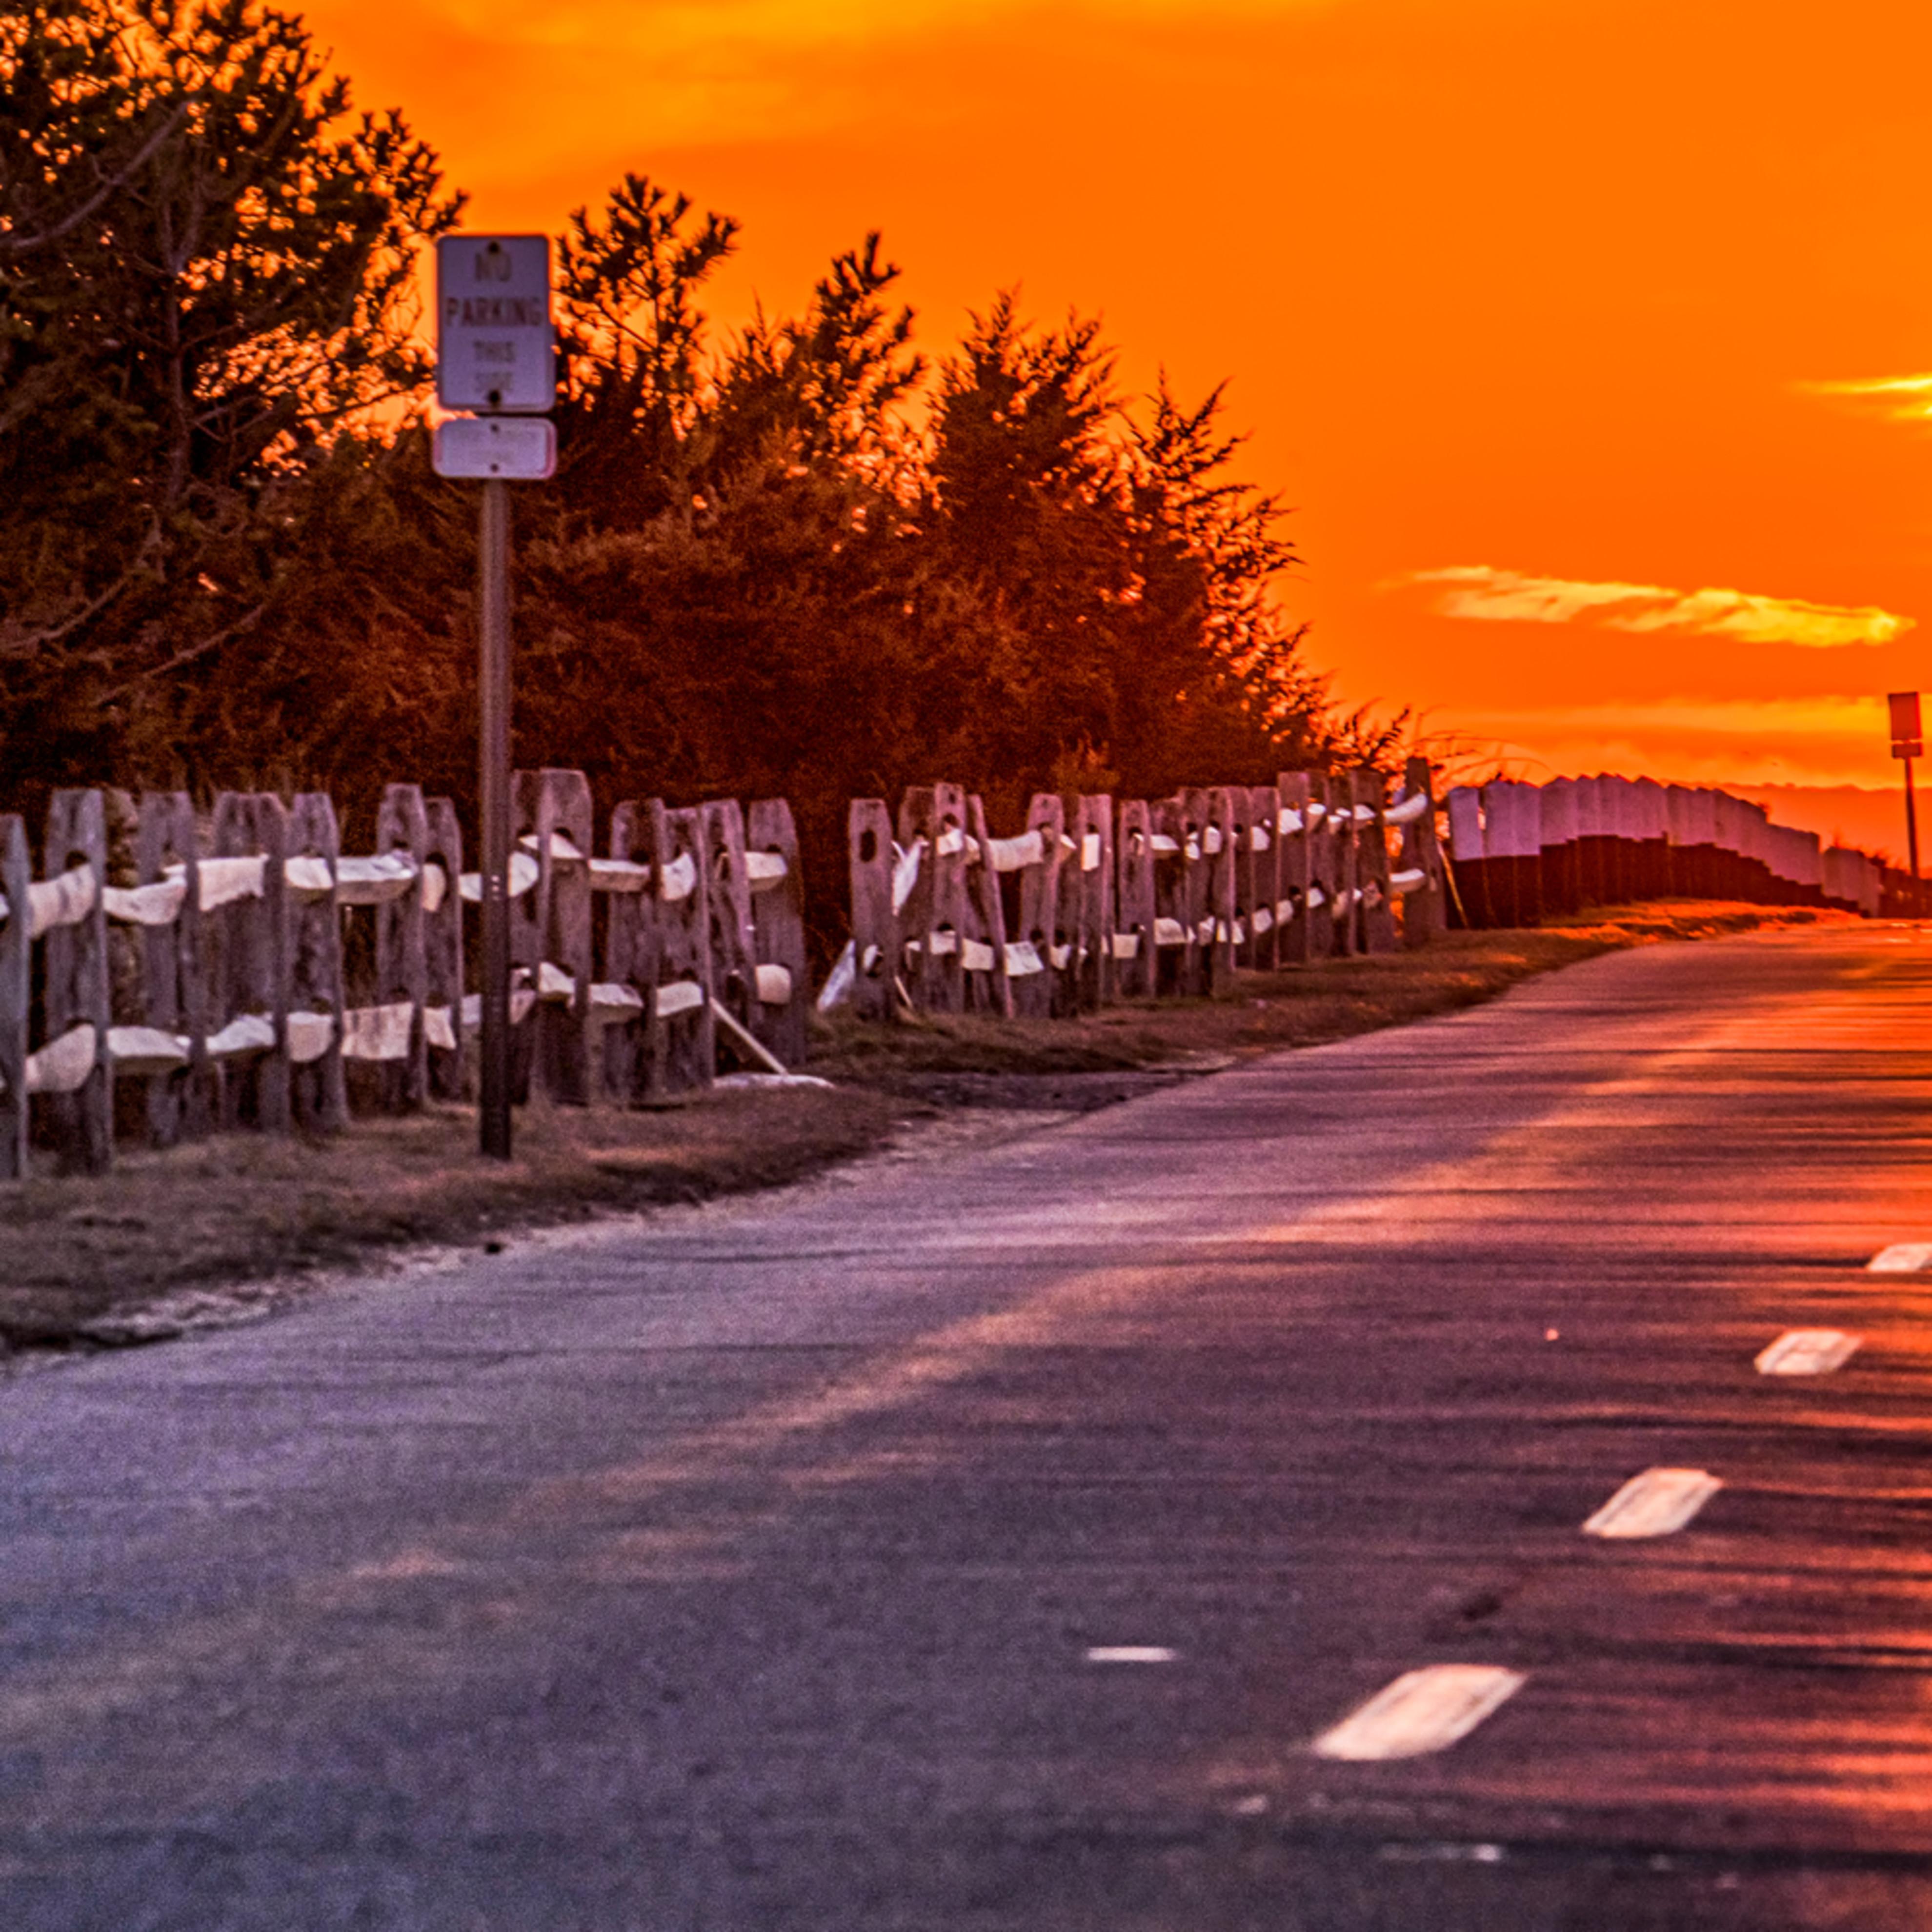 Atlantic ave sunset mpemnb